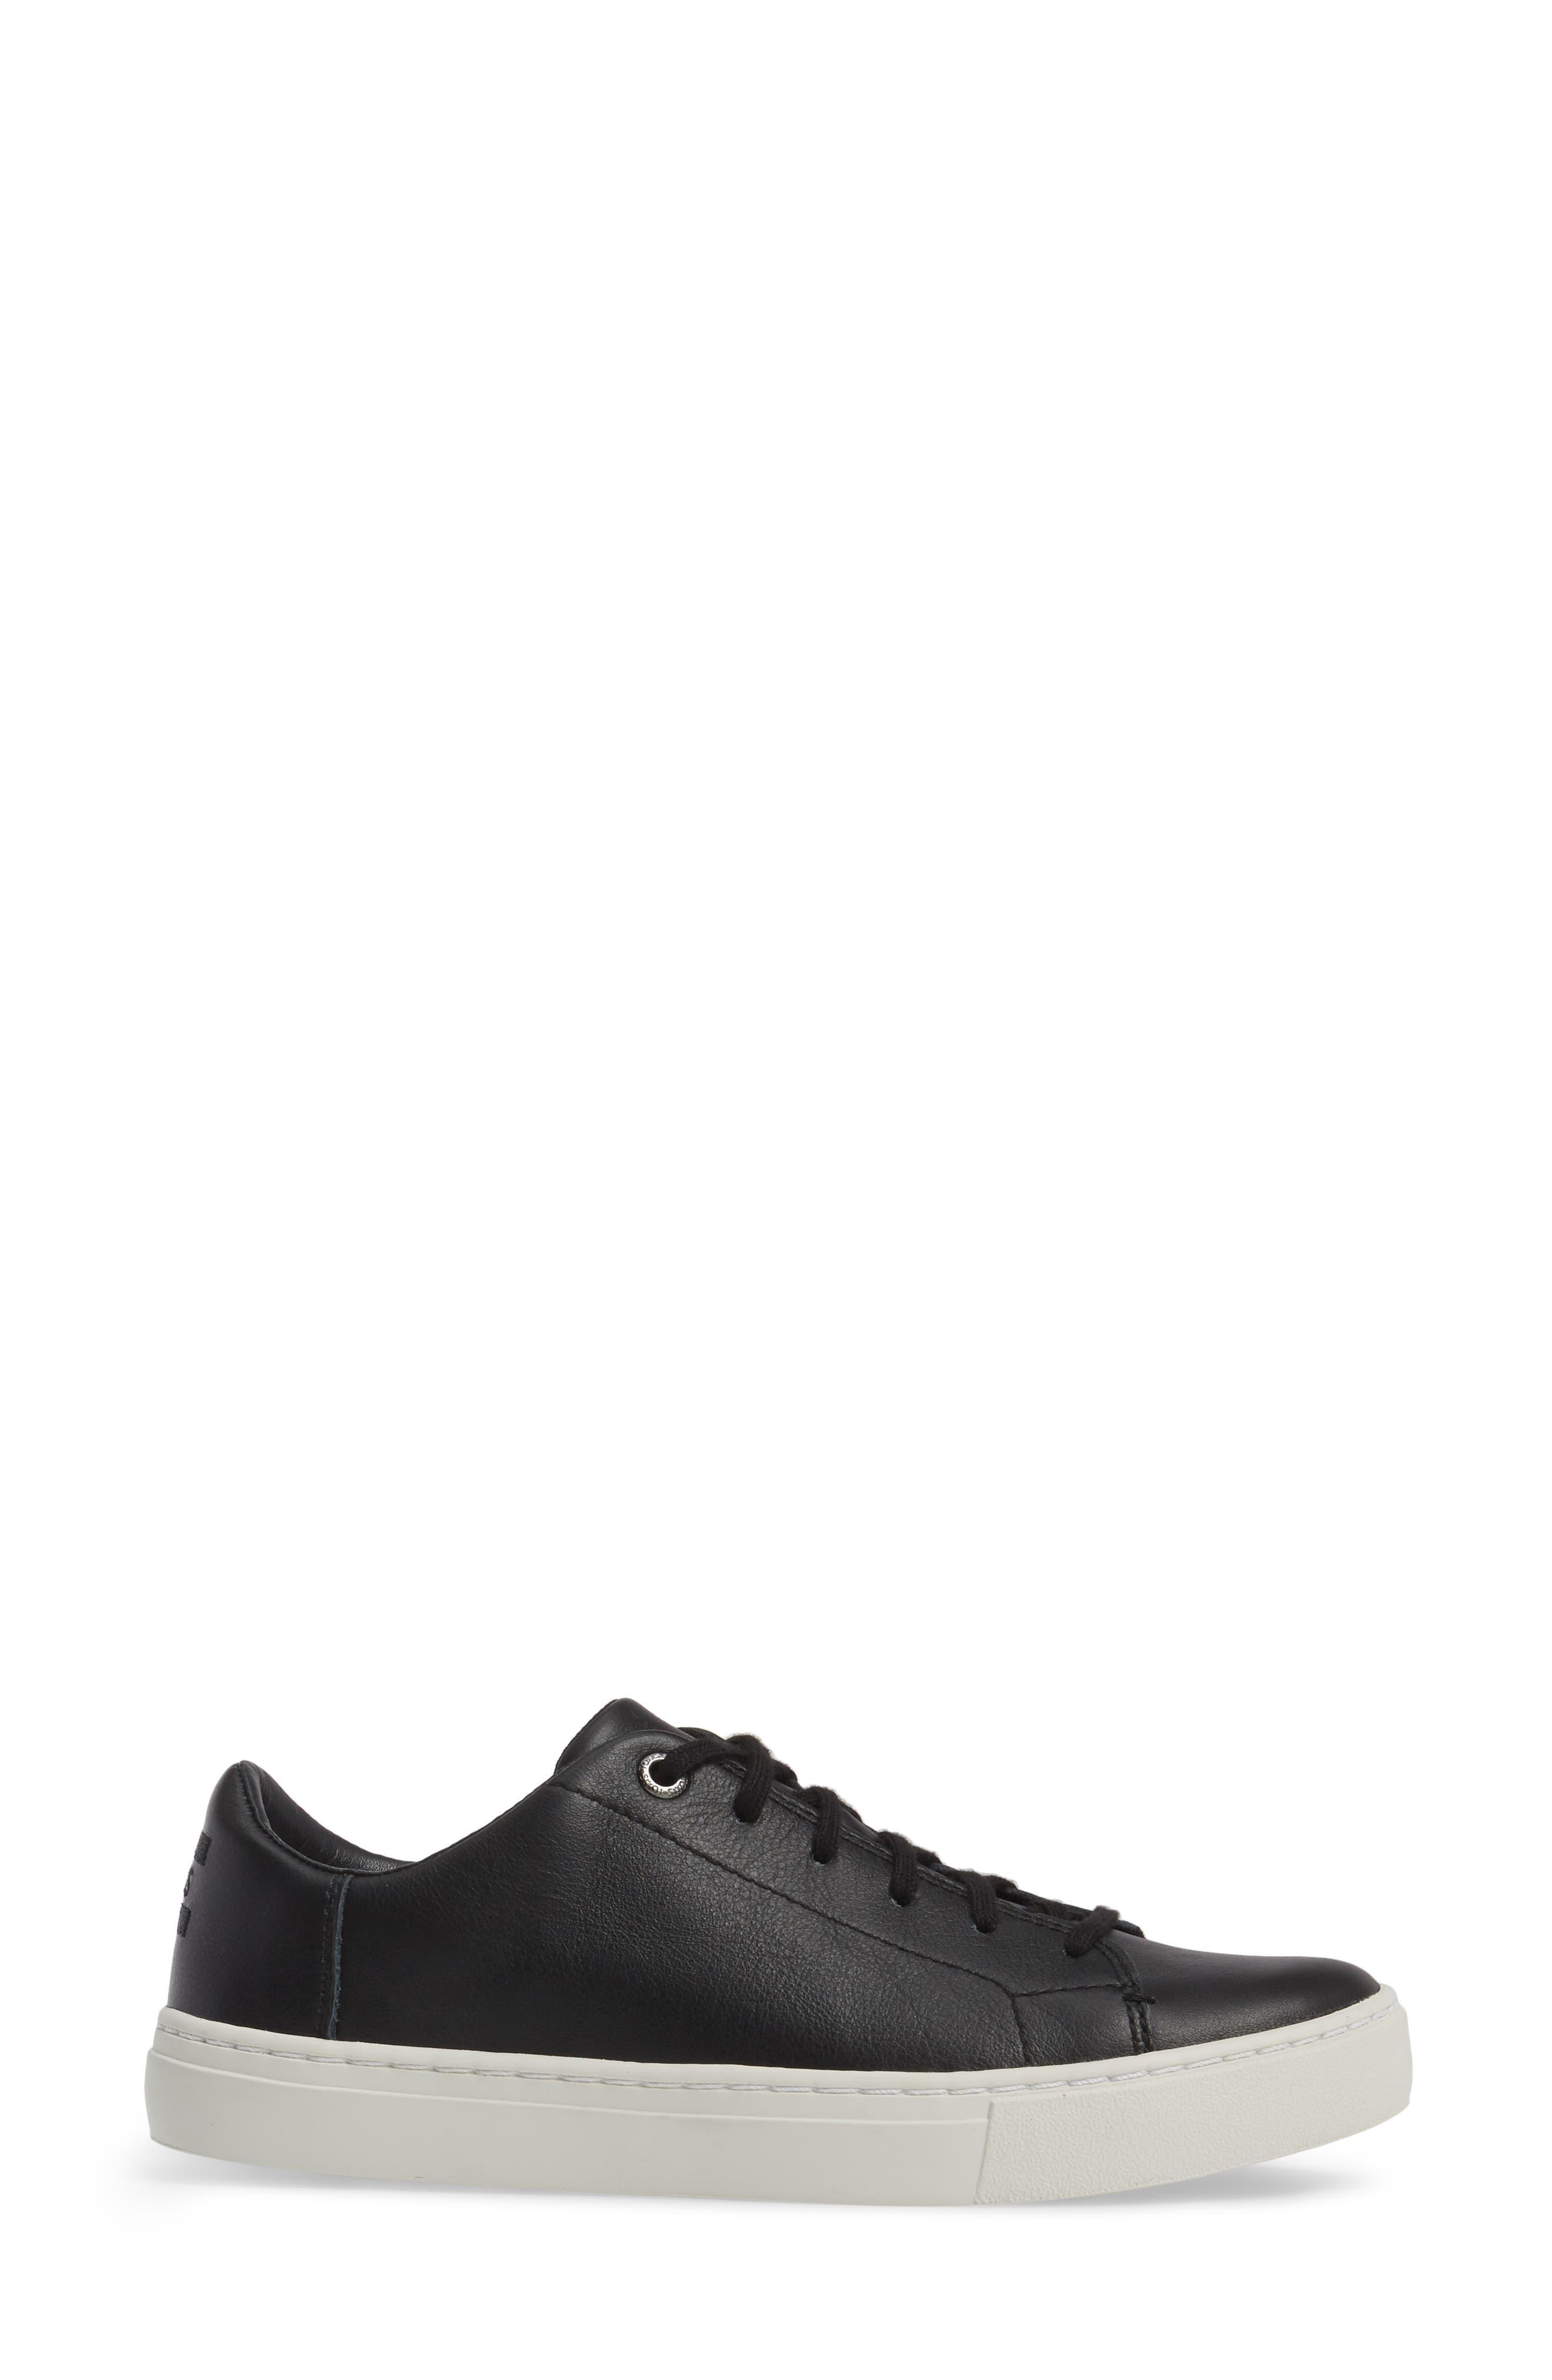 Lenox Sneaker,                             Alternate thumbnail 3, color,                             001